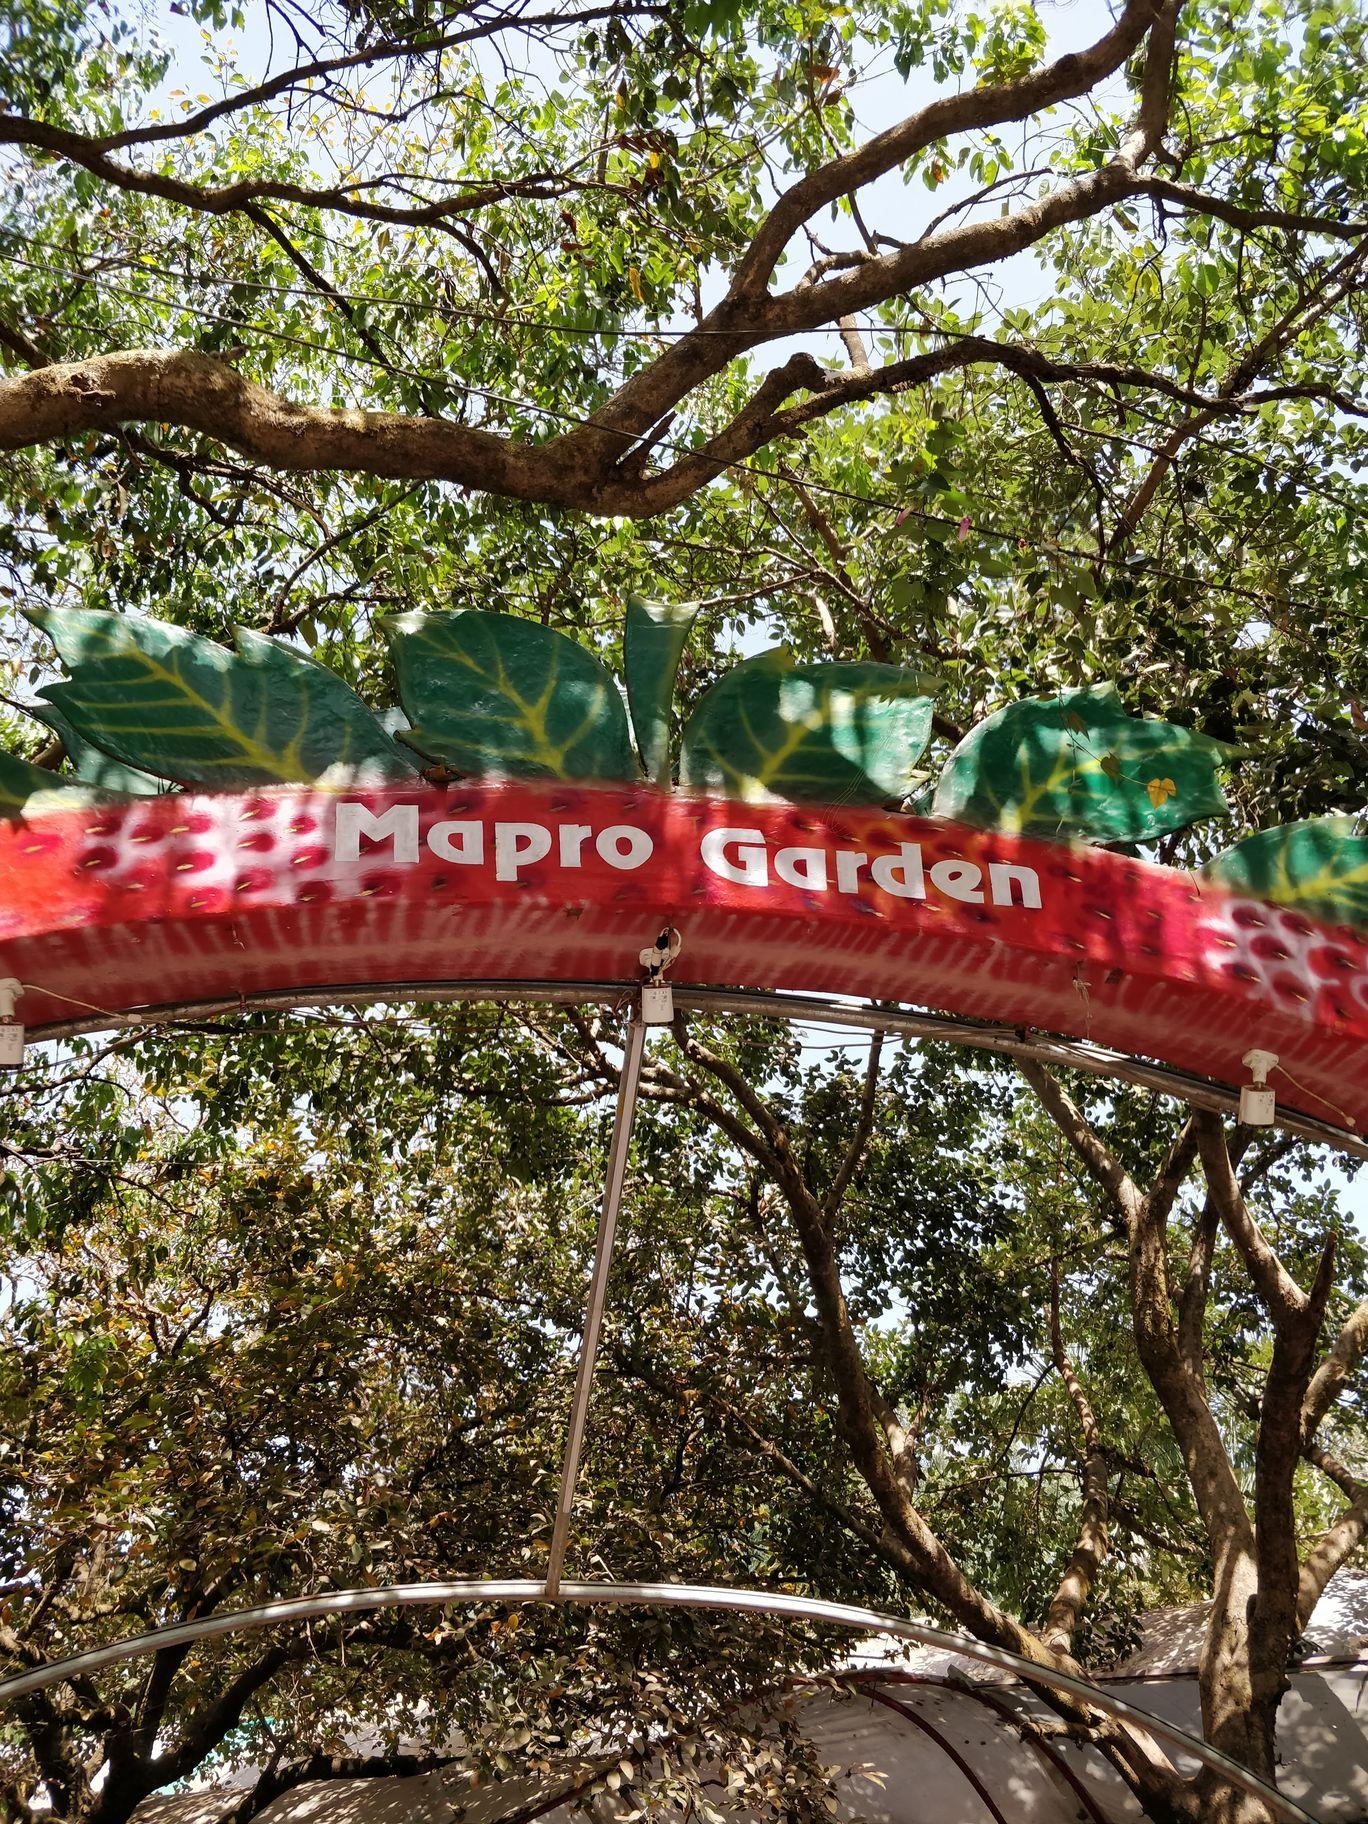 Mapro Garden Mahabaleshwar India View Images Timing And Reviews Tripoto